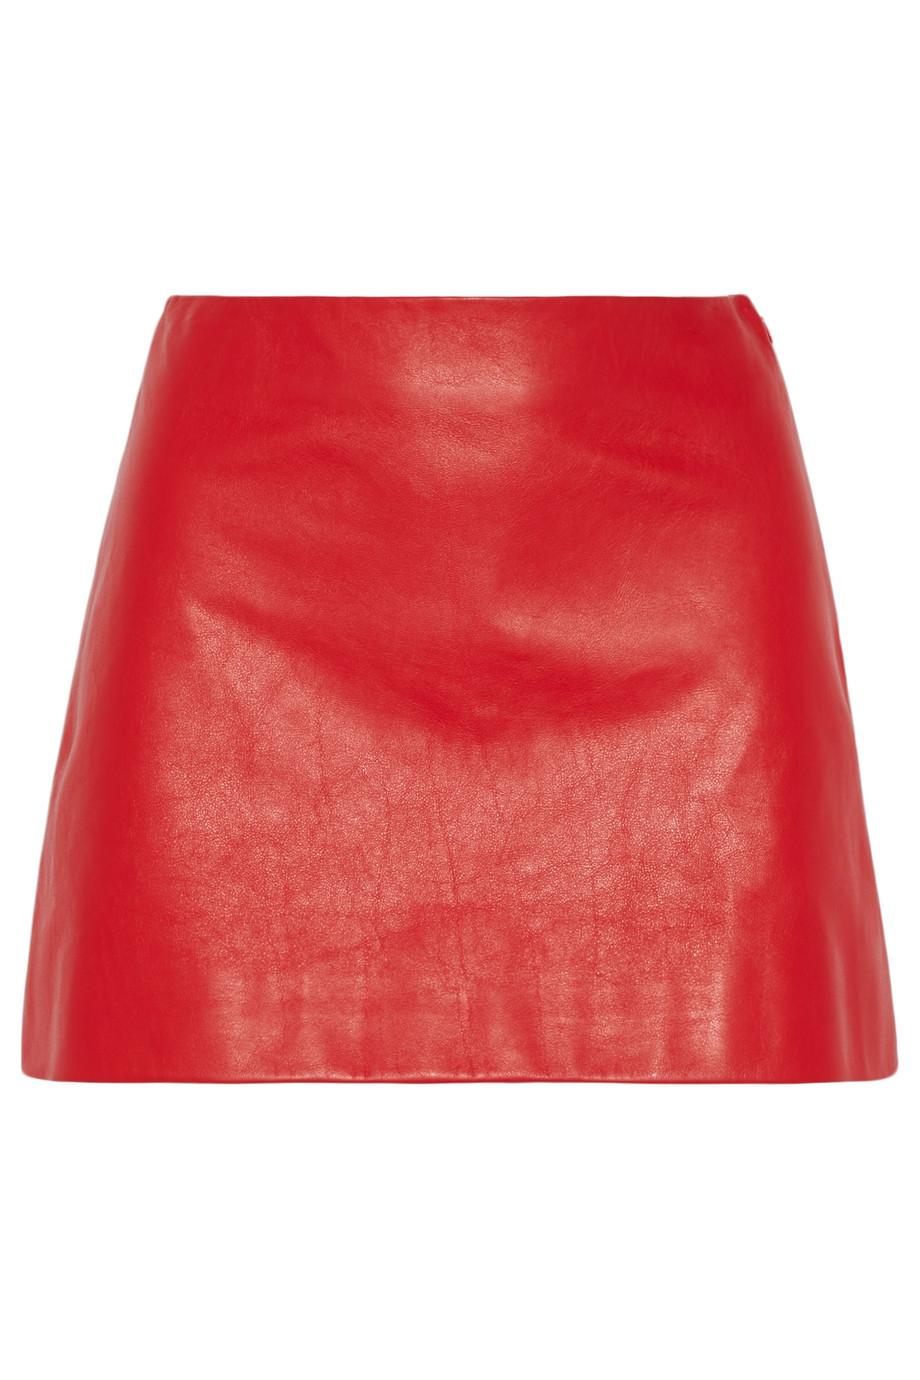 Miu miu Leather Mini Skirt in Red | Lyst